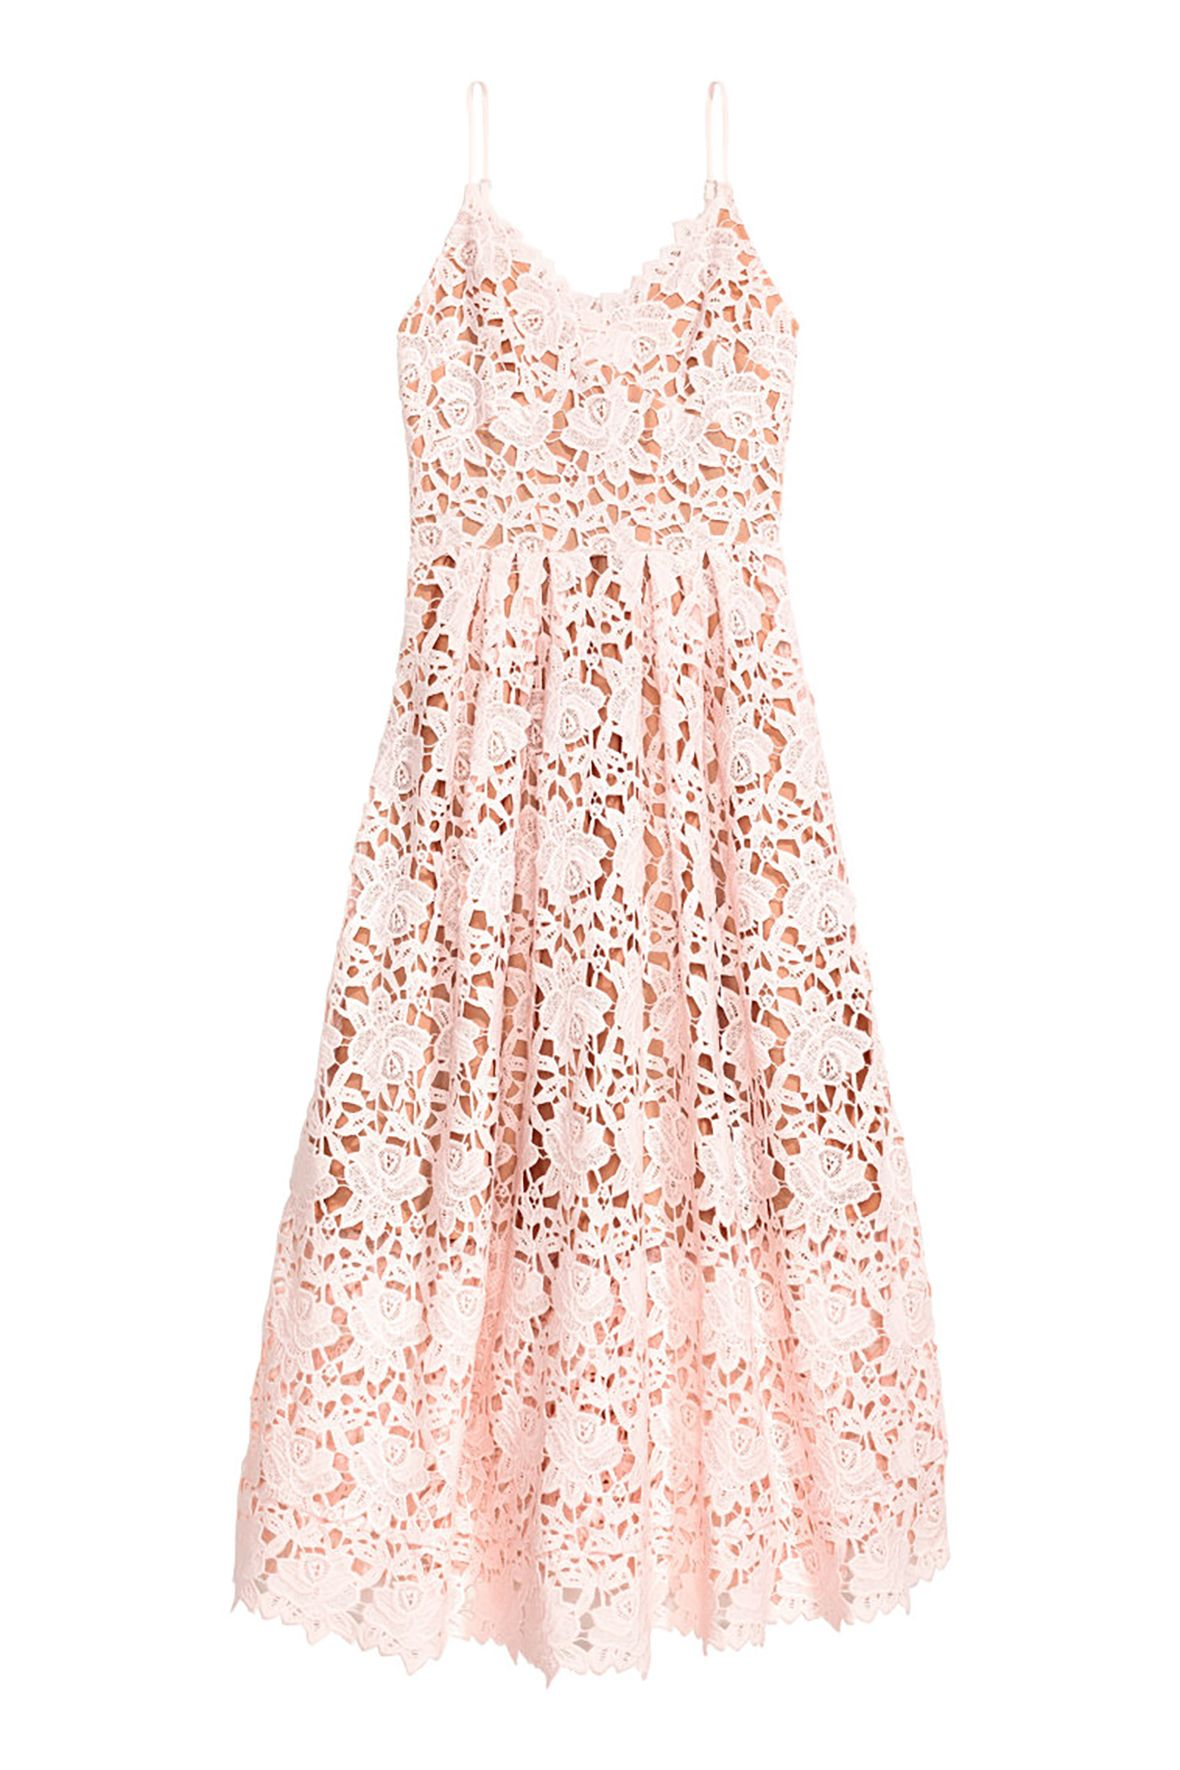 Lace Dress - Poor Little It Girl Weekly Weakness - H&M | FashionBox ...